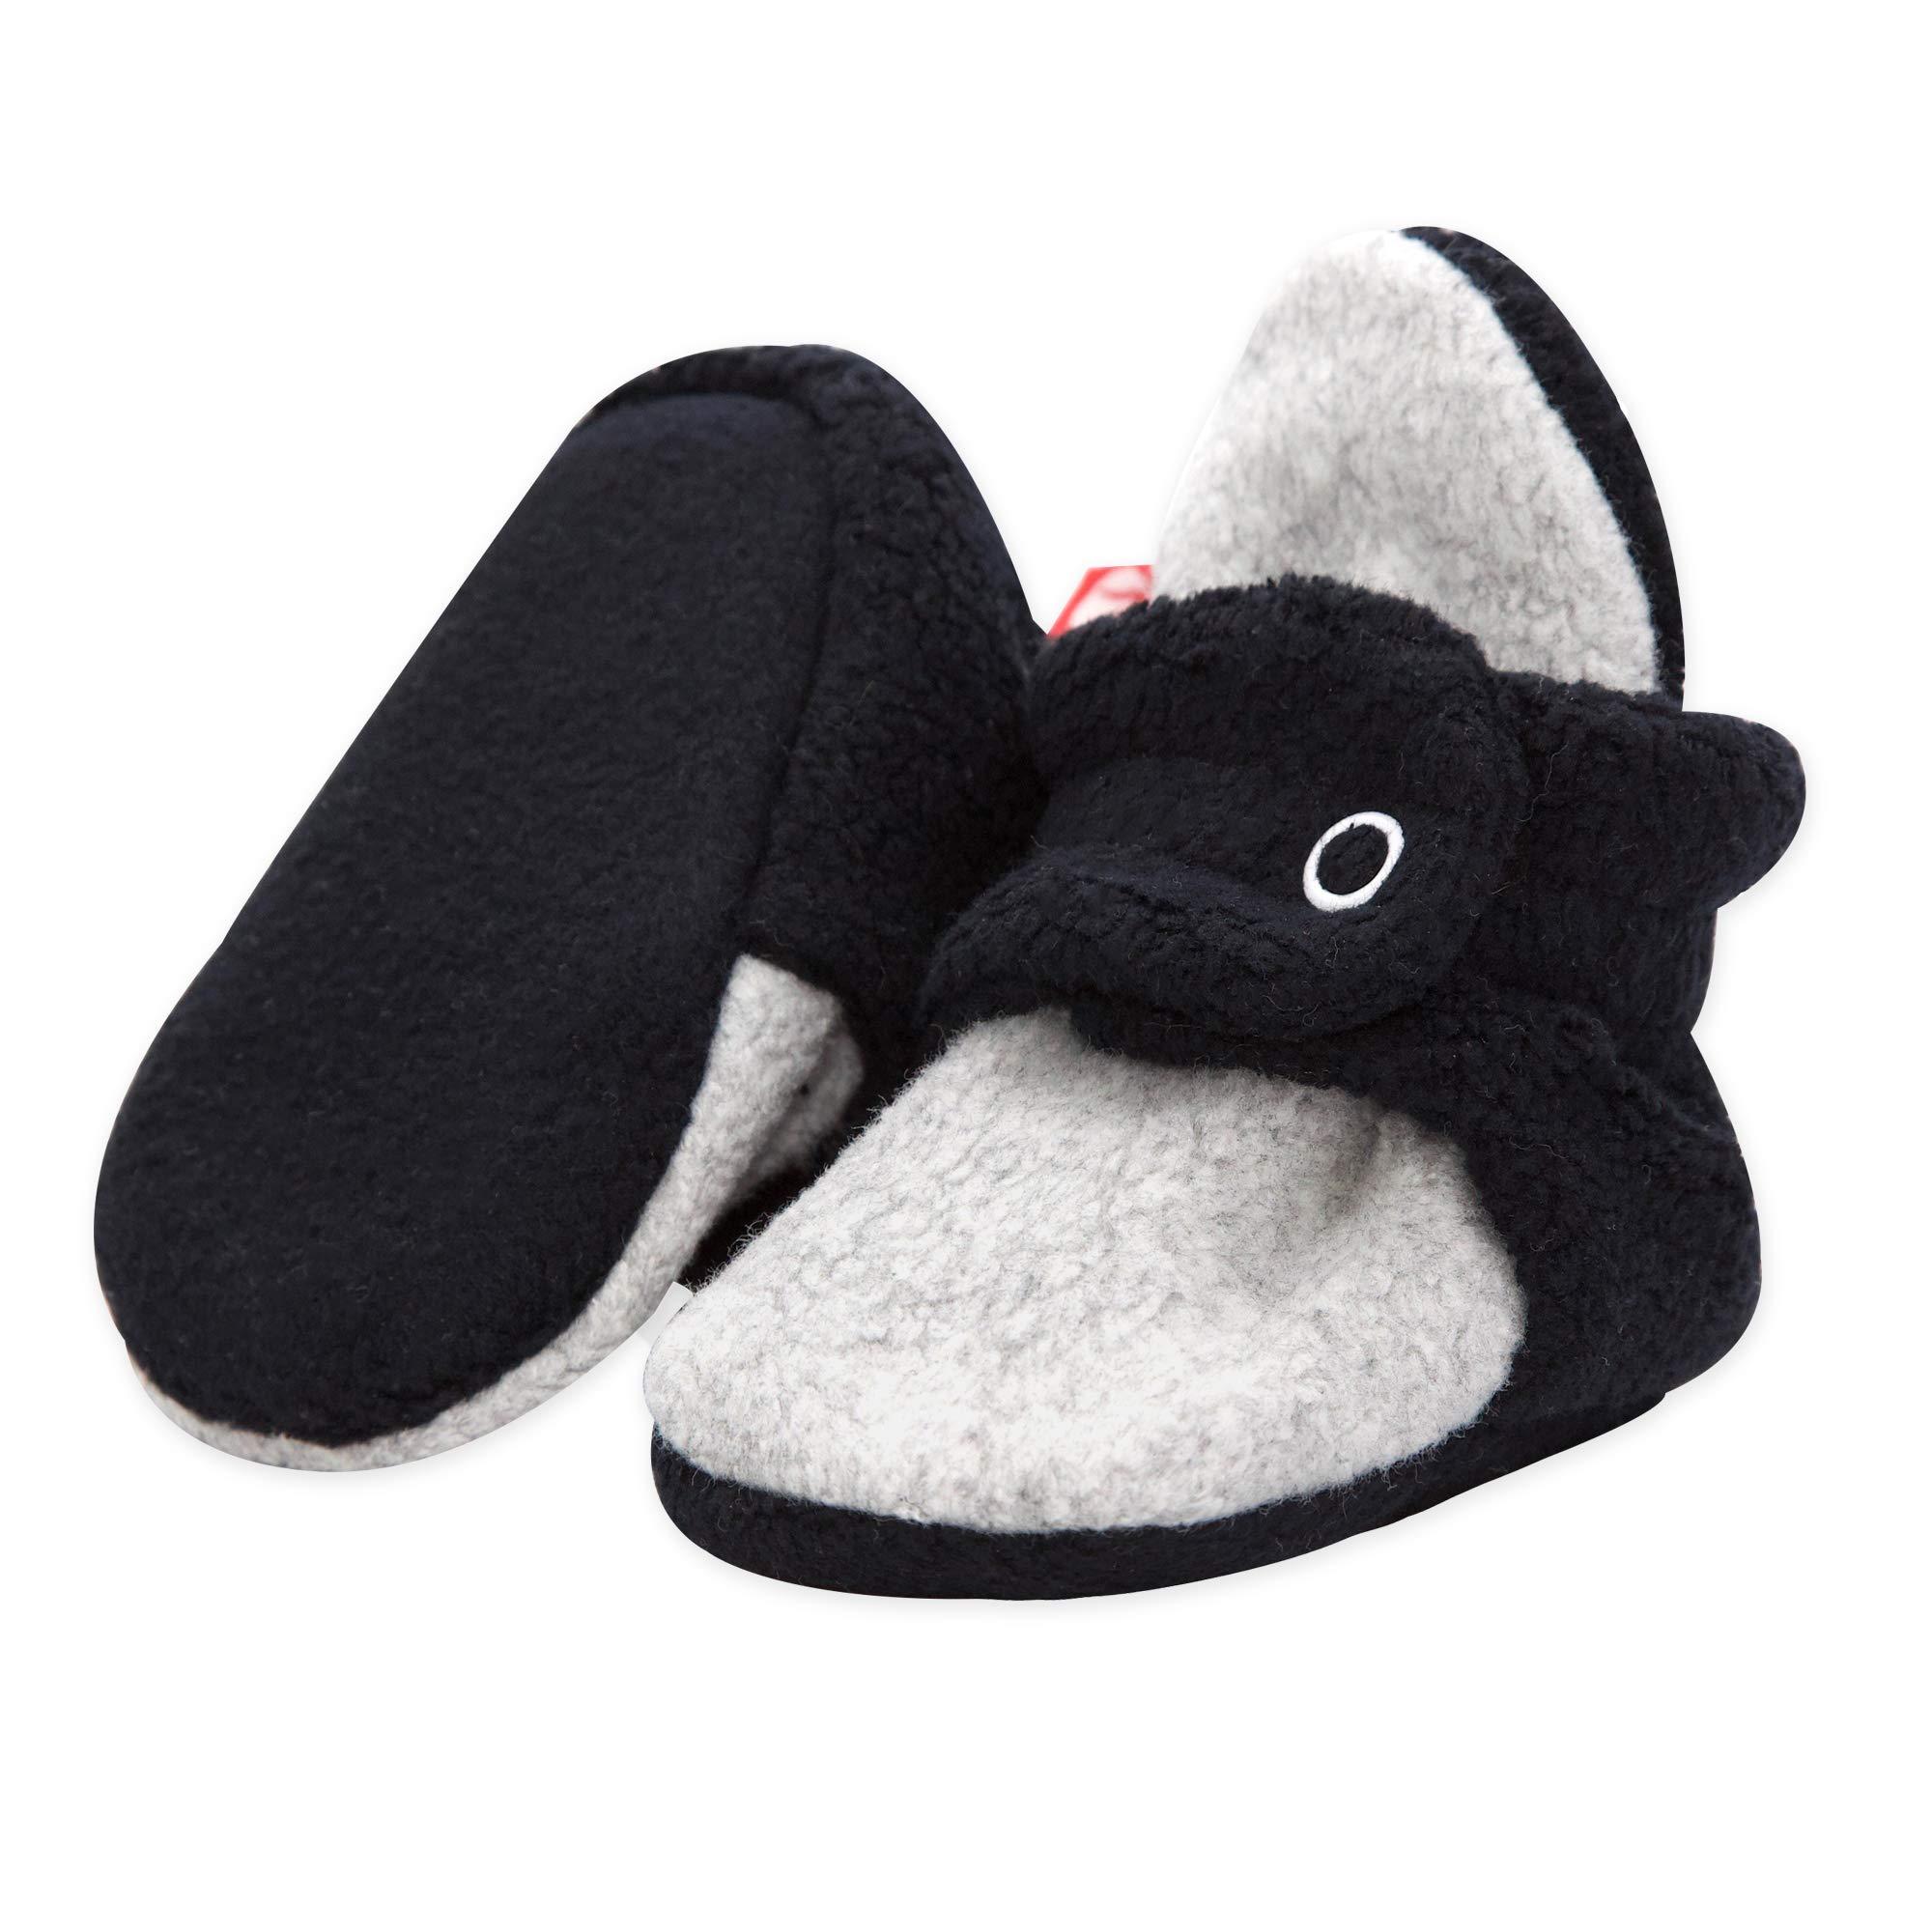 Zutano Double Layer Fleece Baby Booties, Black/Gray